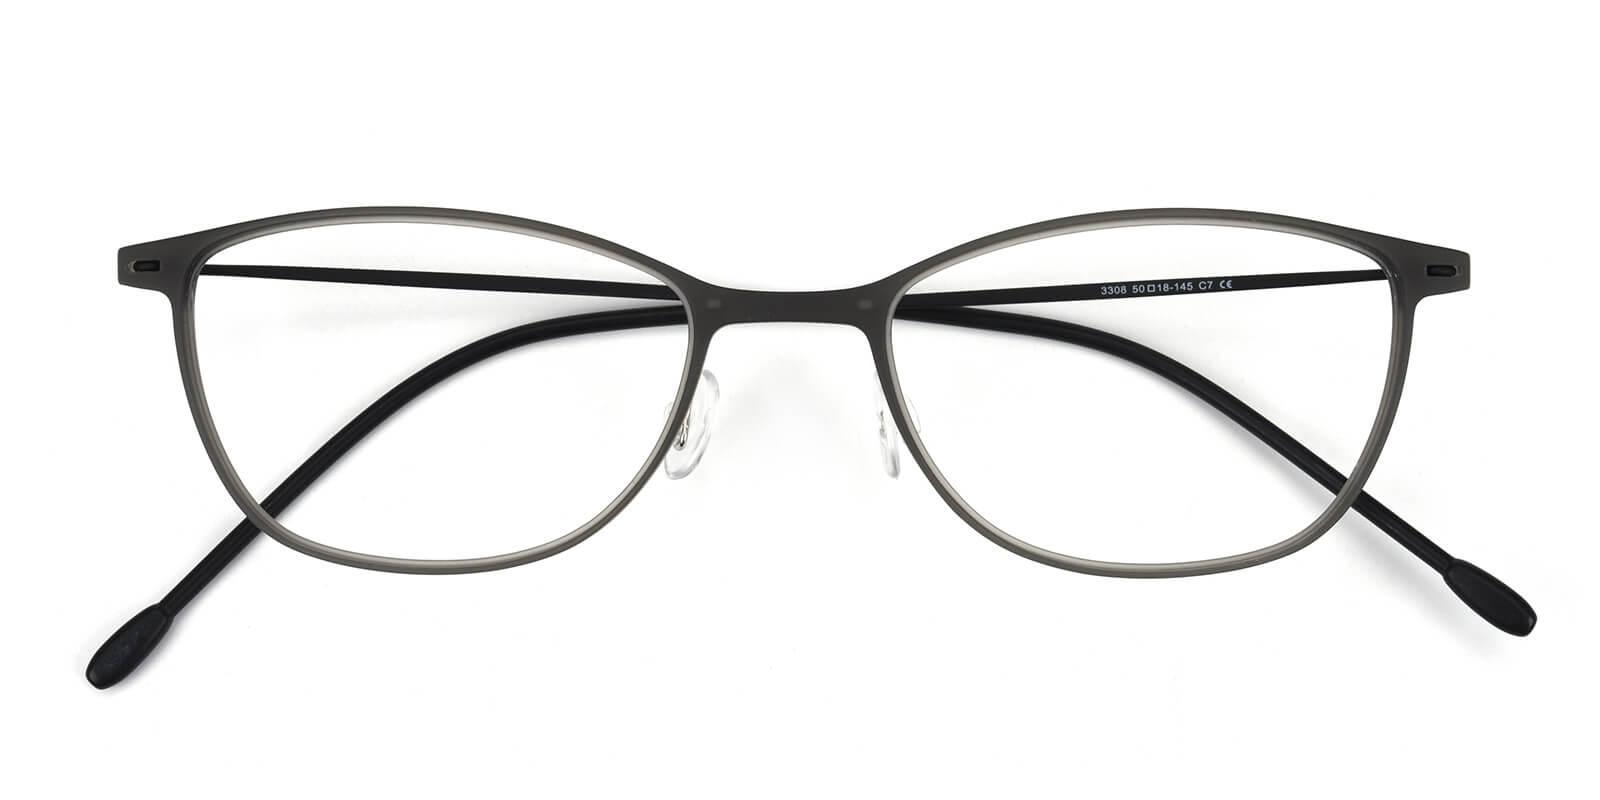 Pridgen-Gray-Rectangle / Cat-Combination-Eyeglasses-detail